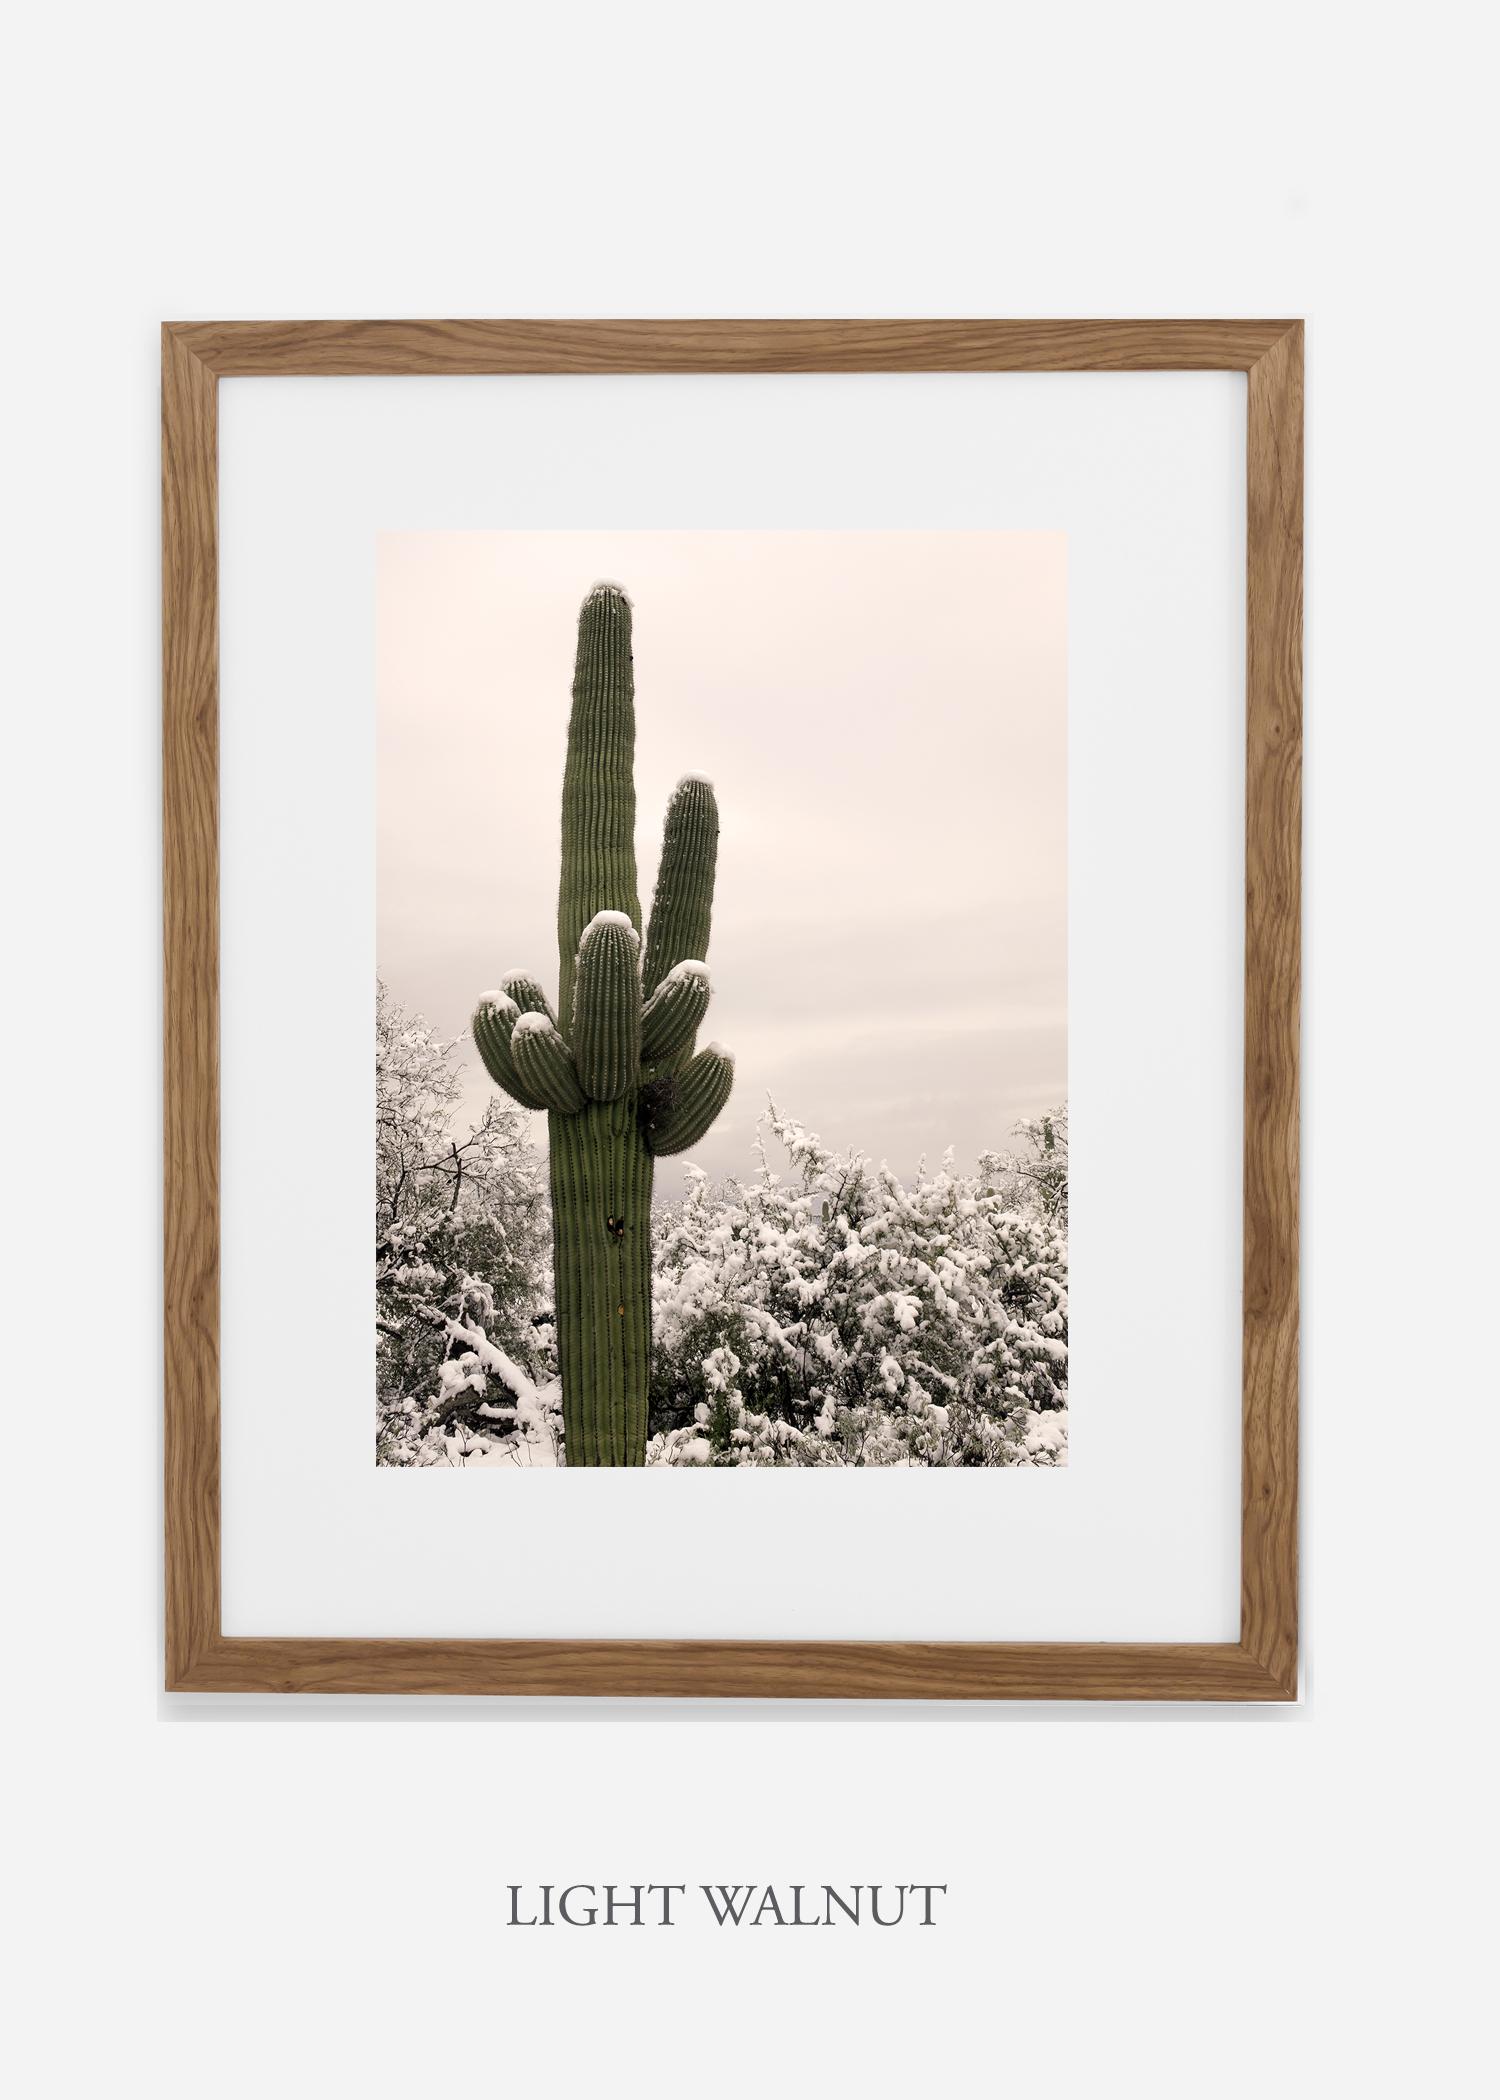 lightwalnutframe-saguaroNo.6-wildercalifornia-art-wallart-cactusprint-homedecor-prints-arizona-botanical-artwork-interiordesign.jpg